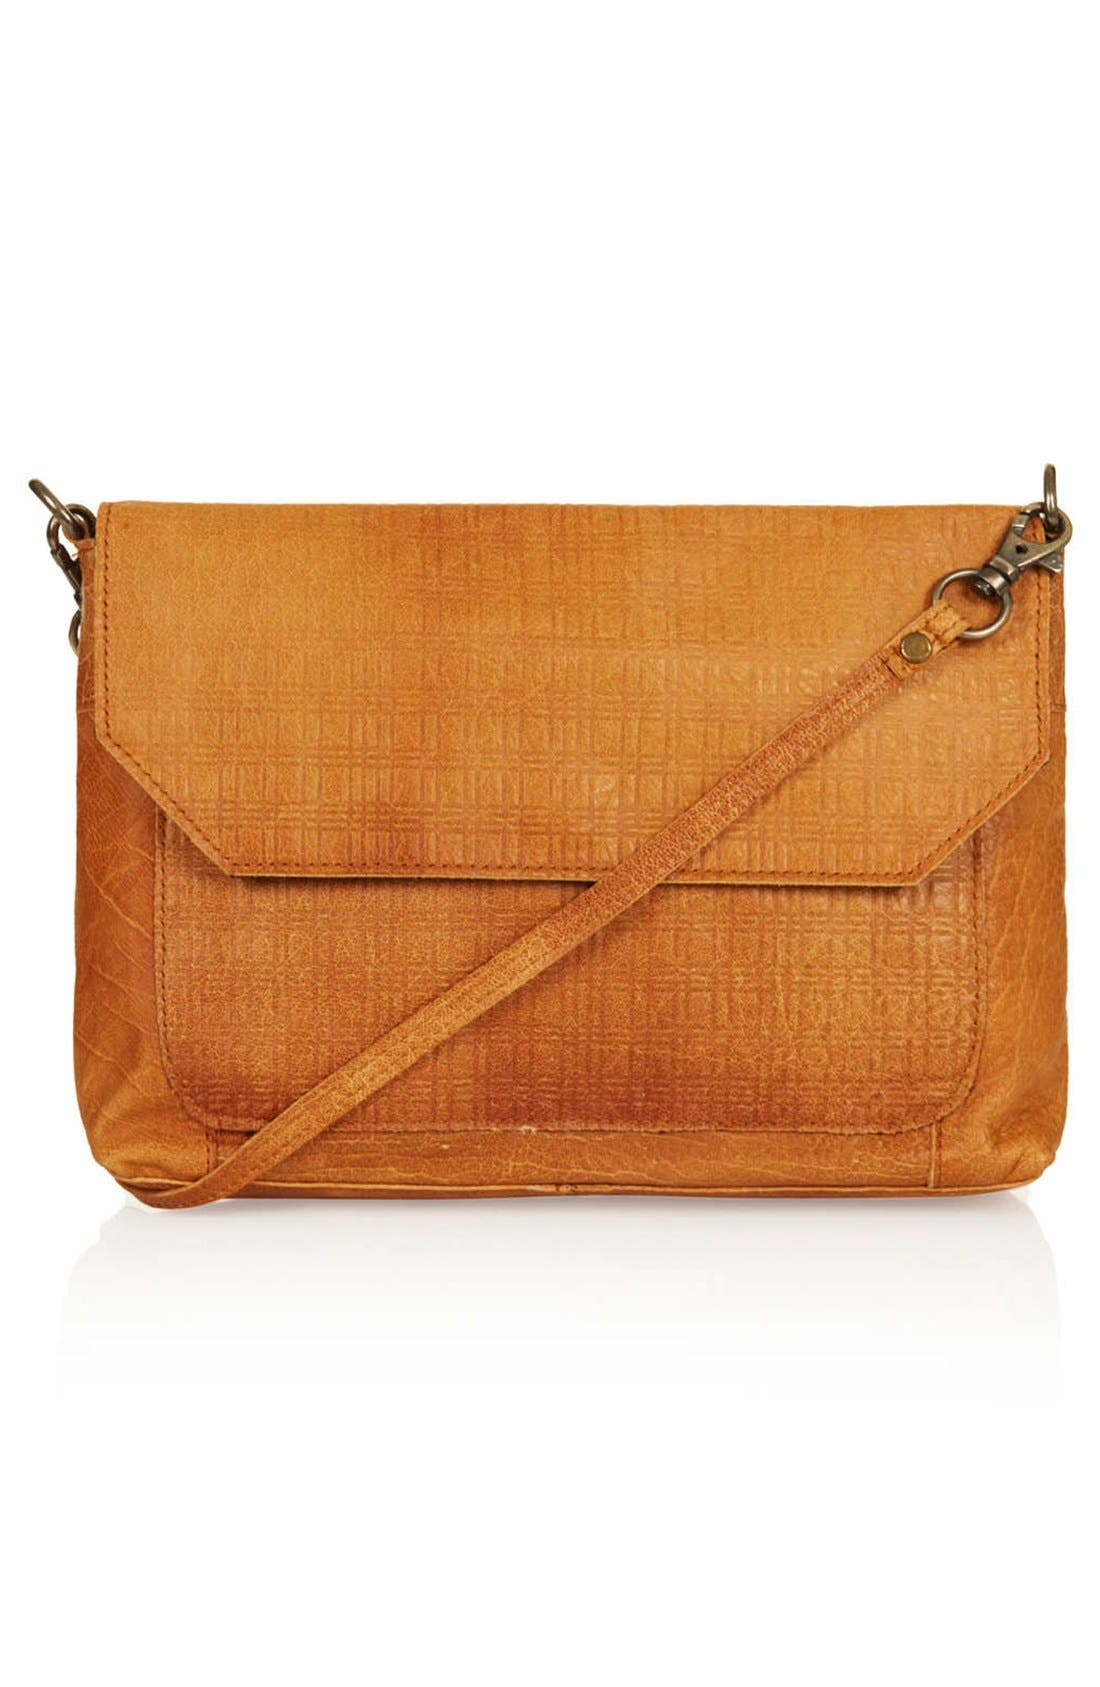 Main Image - Topshop Textured Leather Crossbody Bag